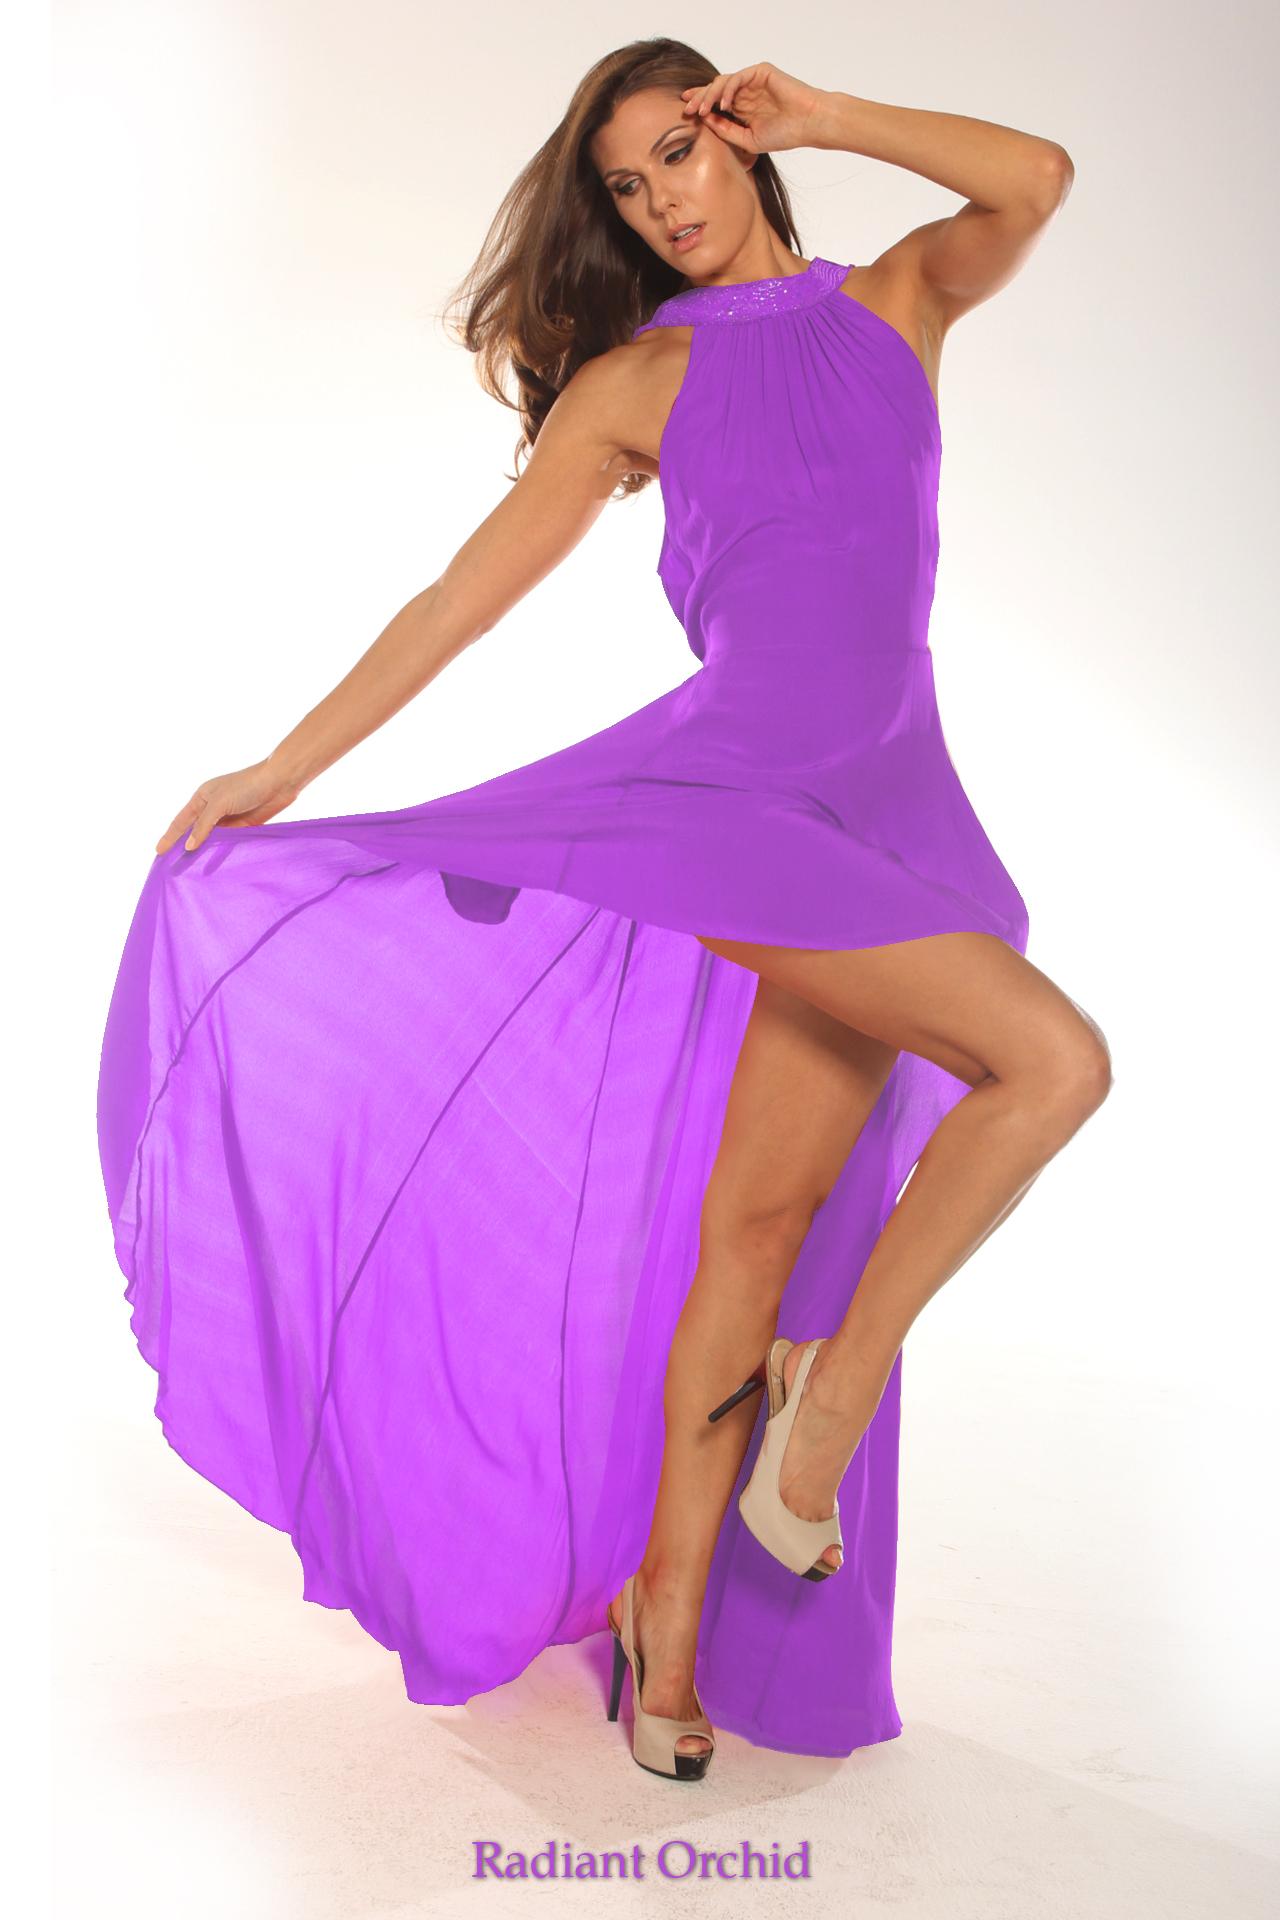 Parides Hi Low Maxi Dress in Radiant Orchid Color